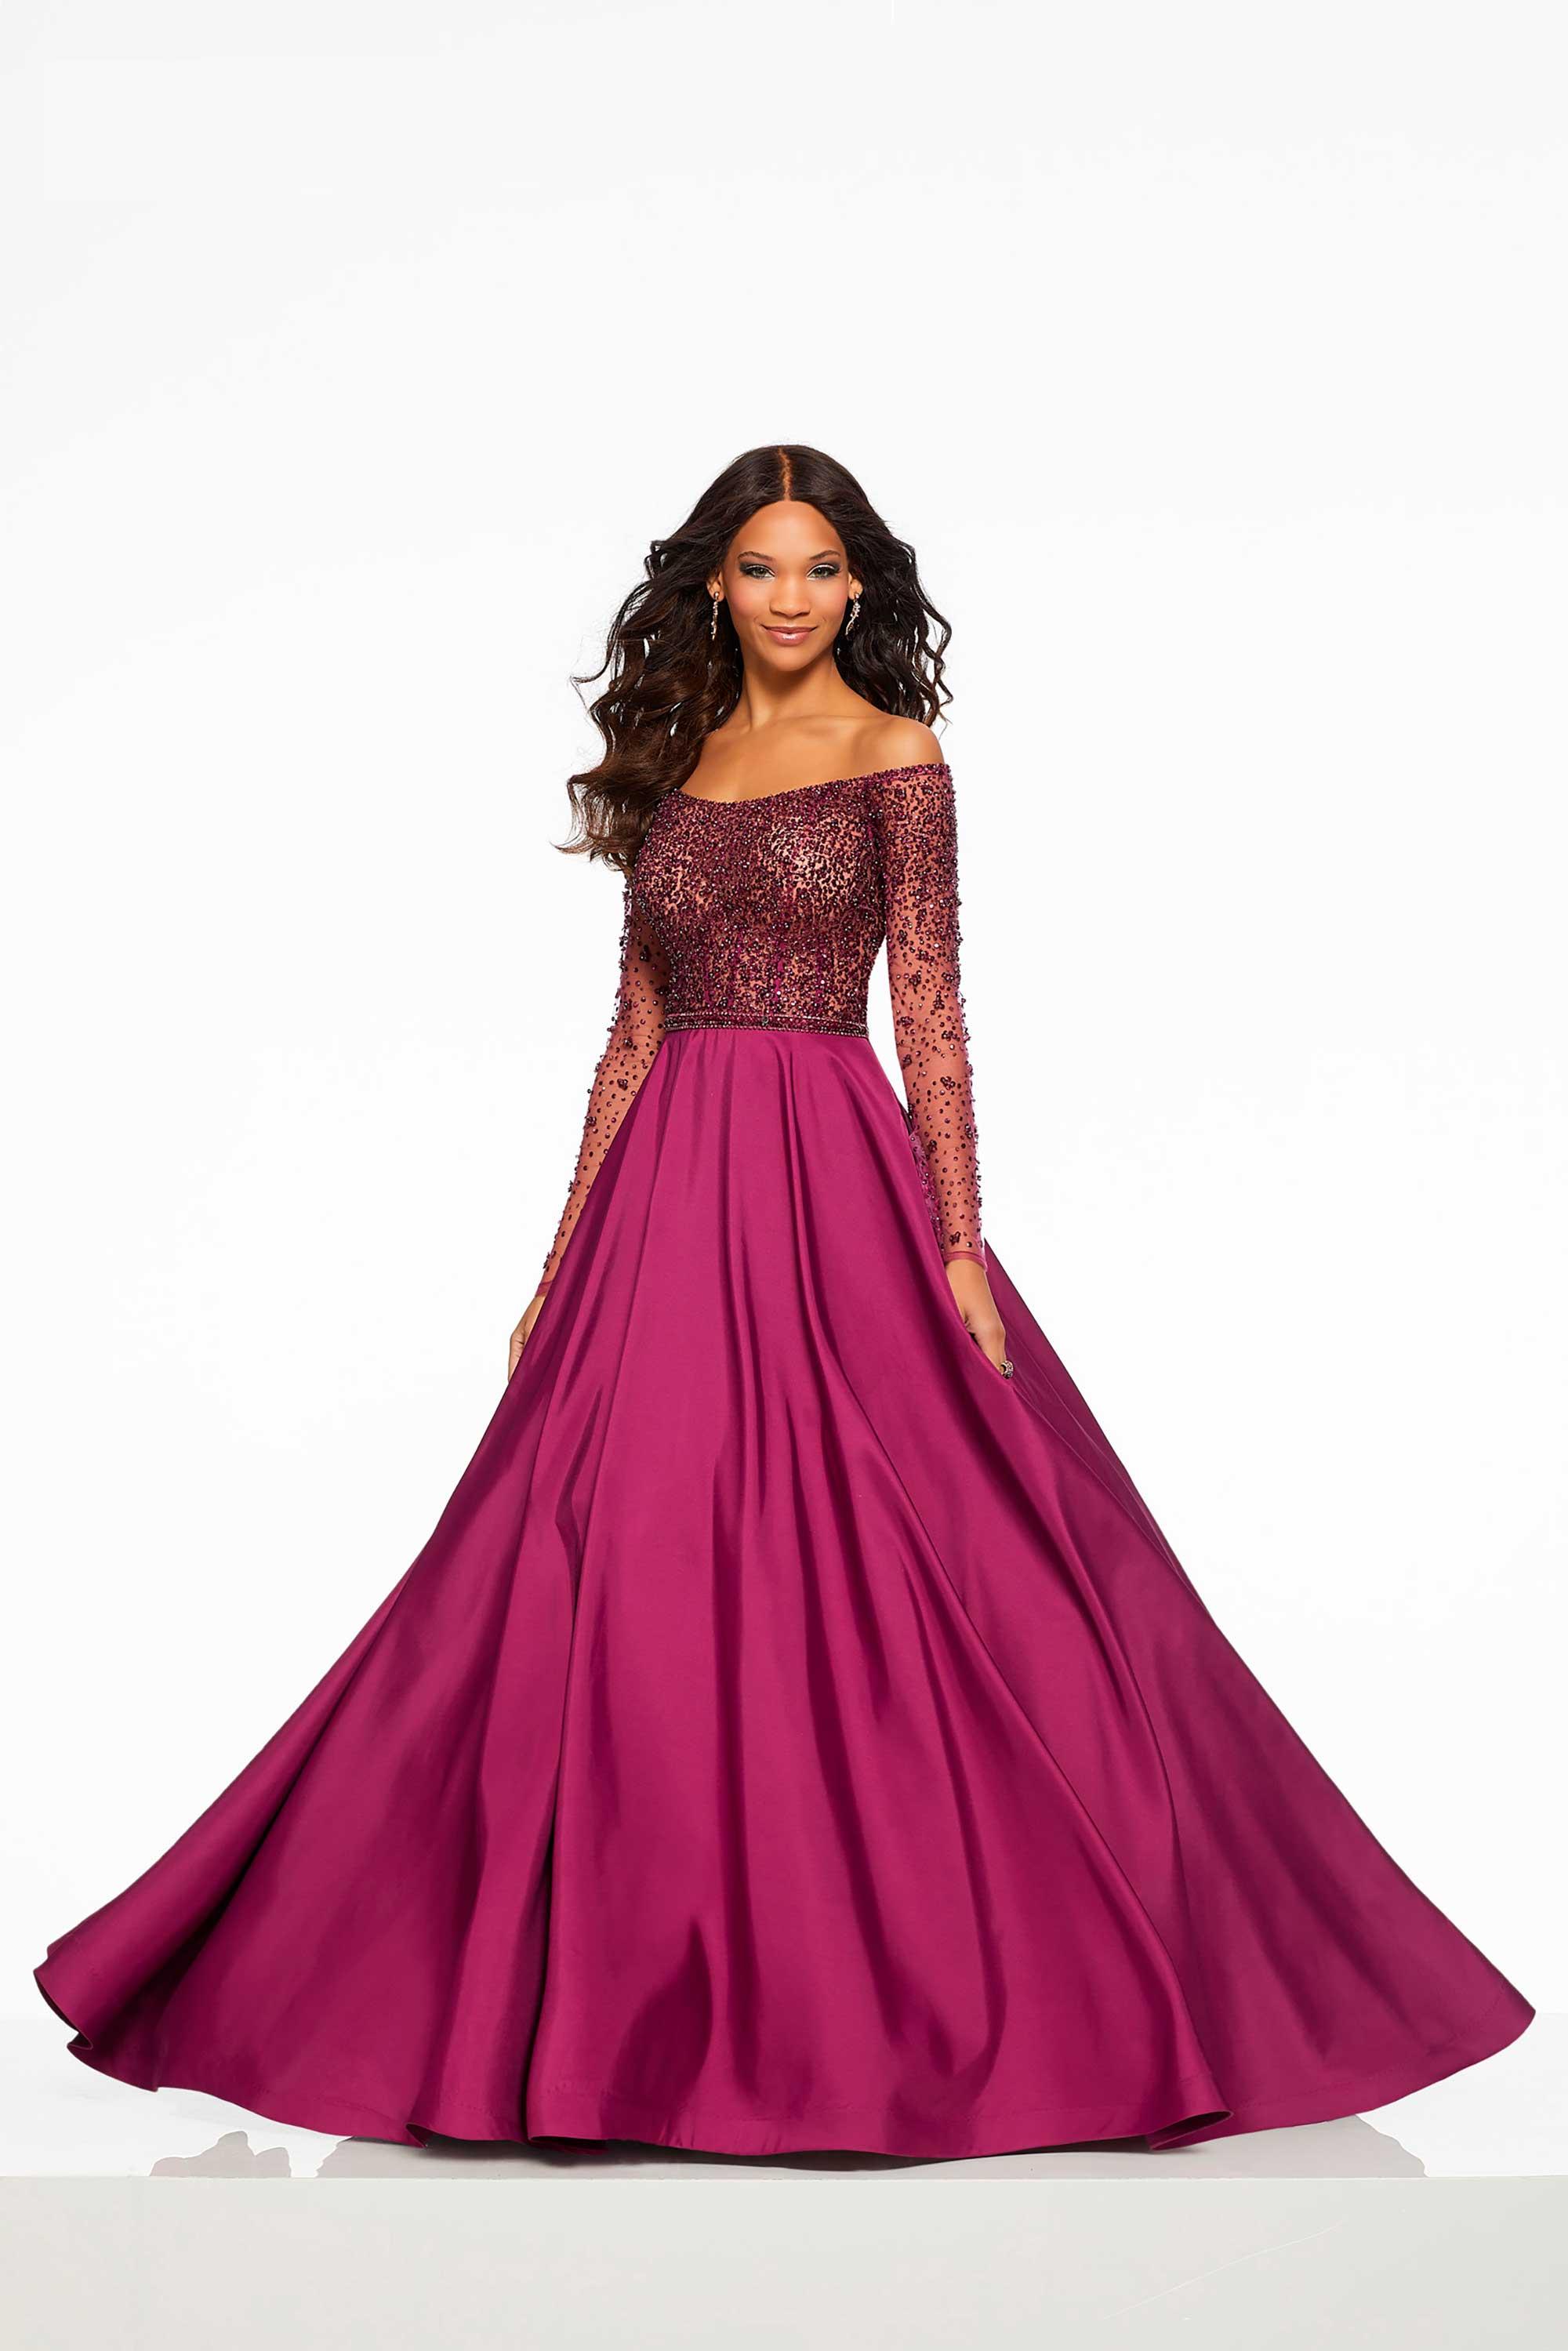 Vestido Lucía Fiesta 2019 mod. 43031 - 2